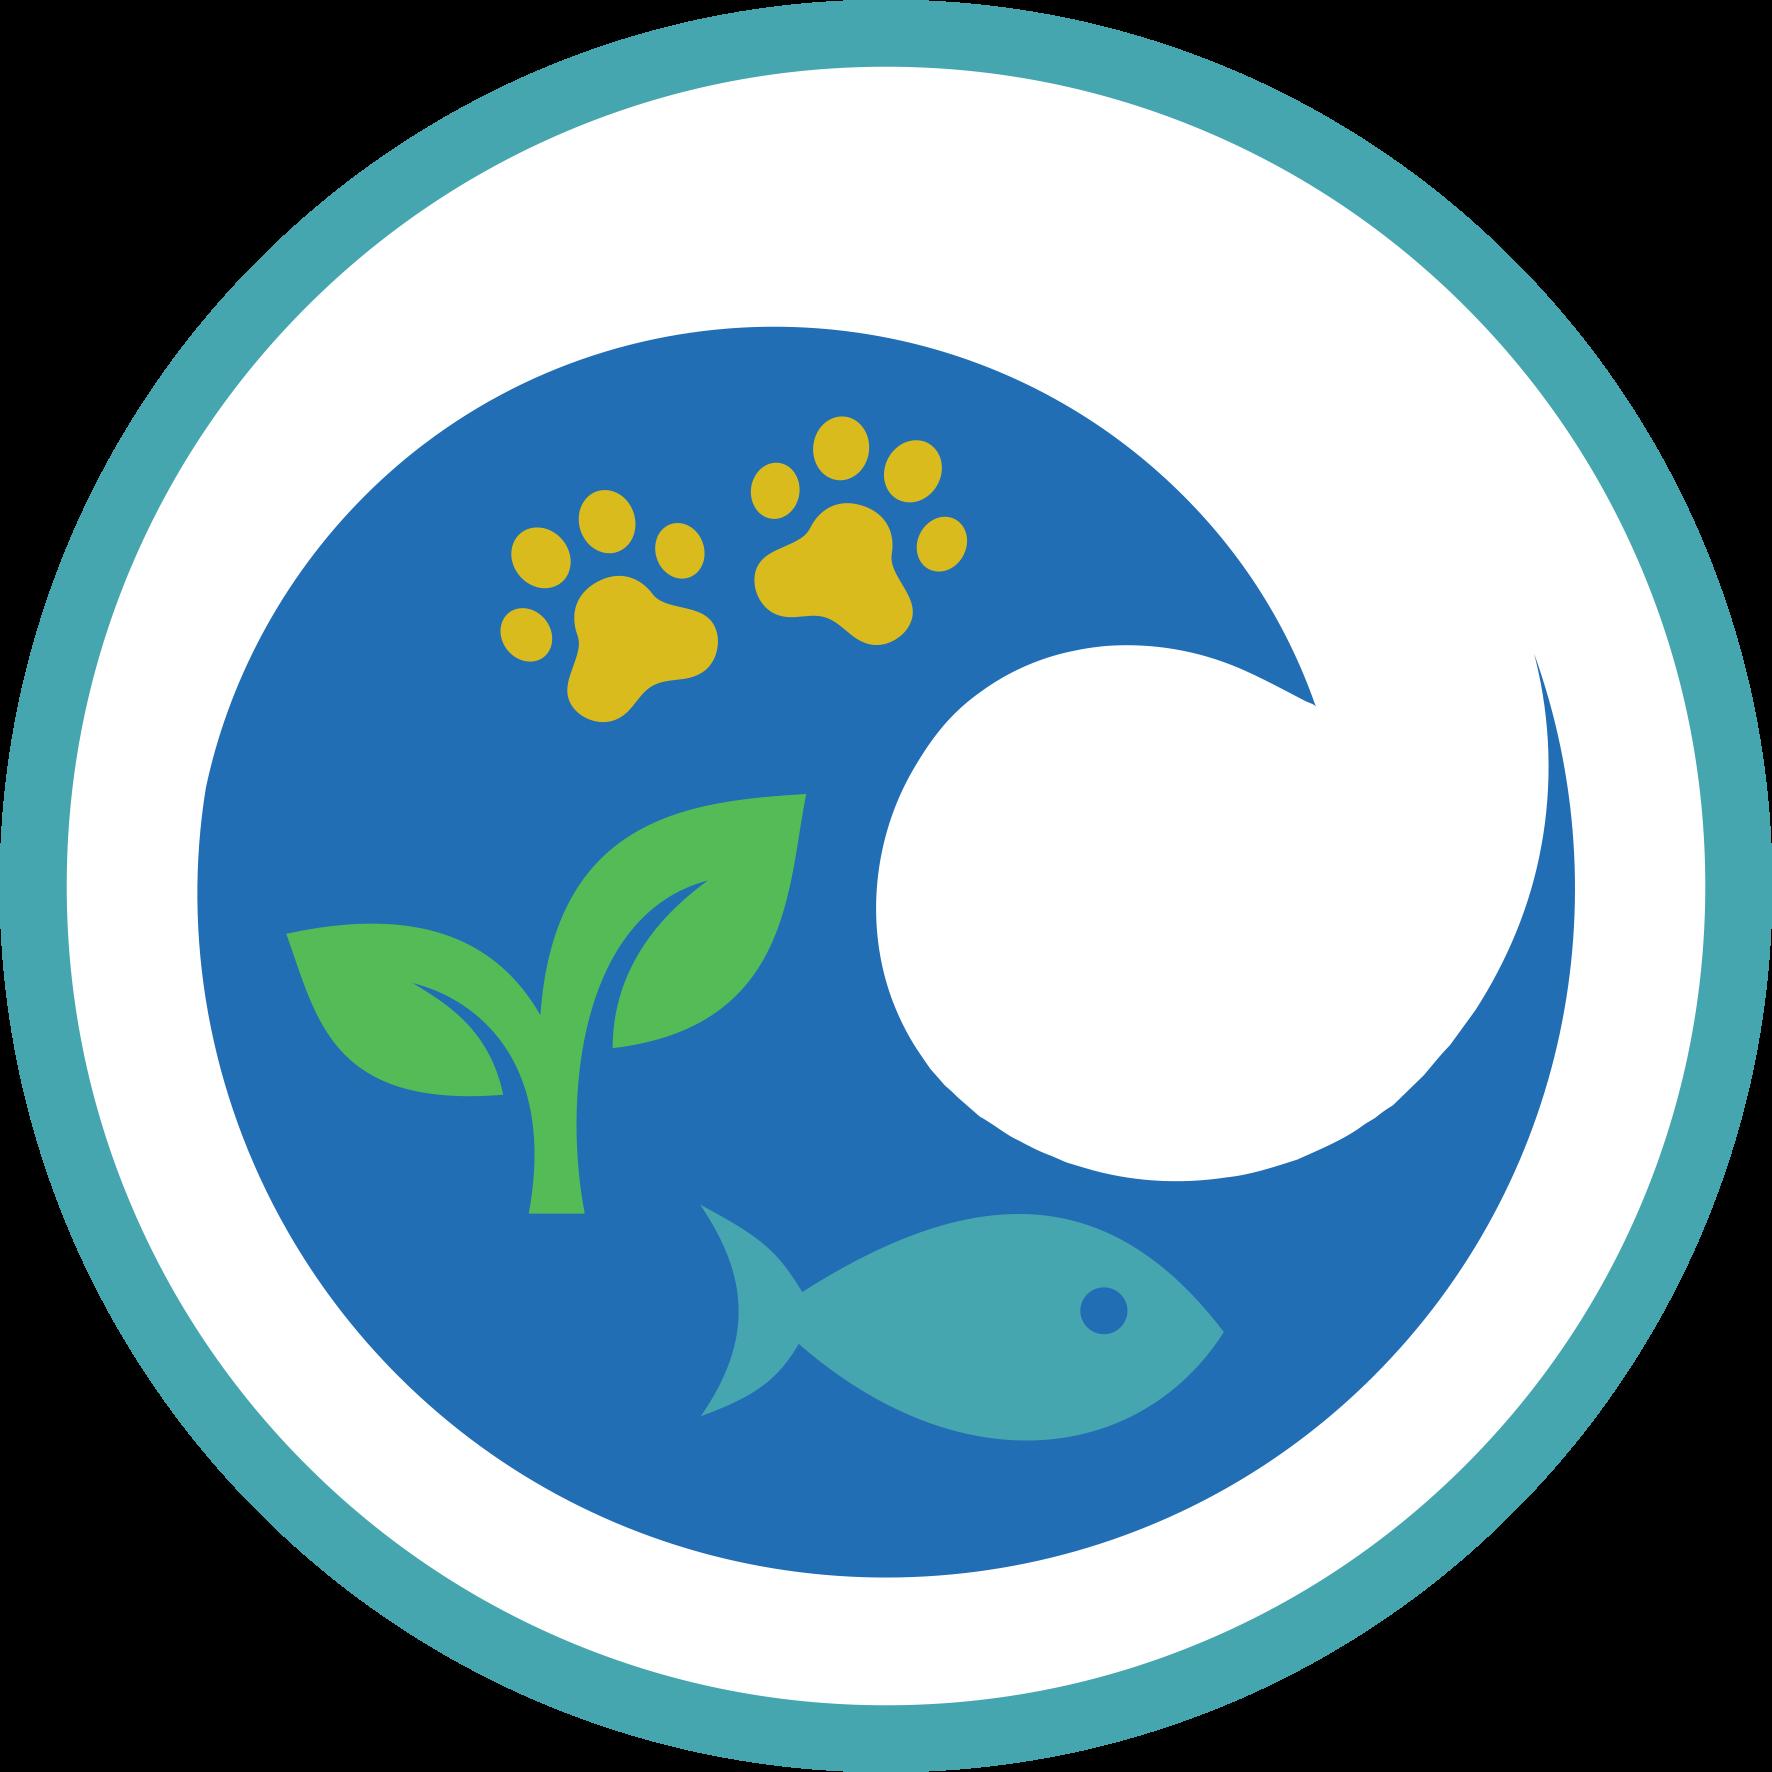 Cap-net Ecosystems UNDP